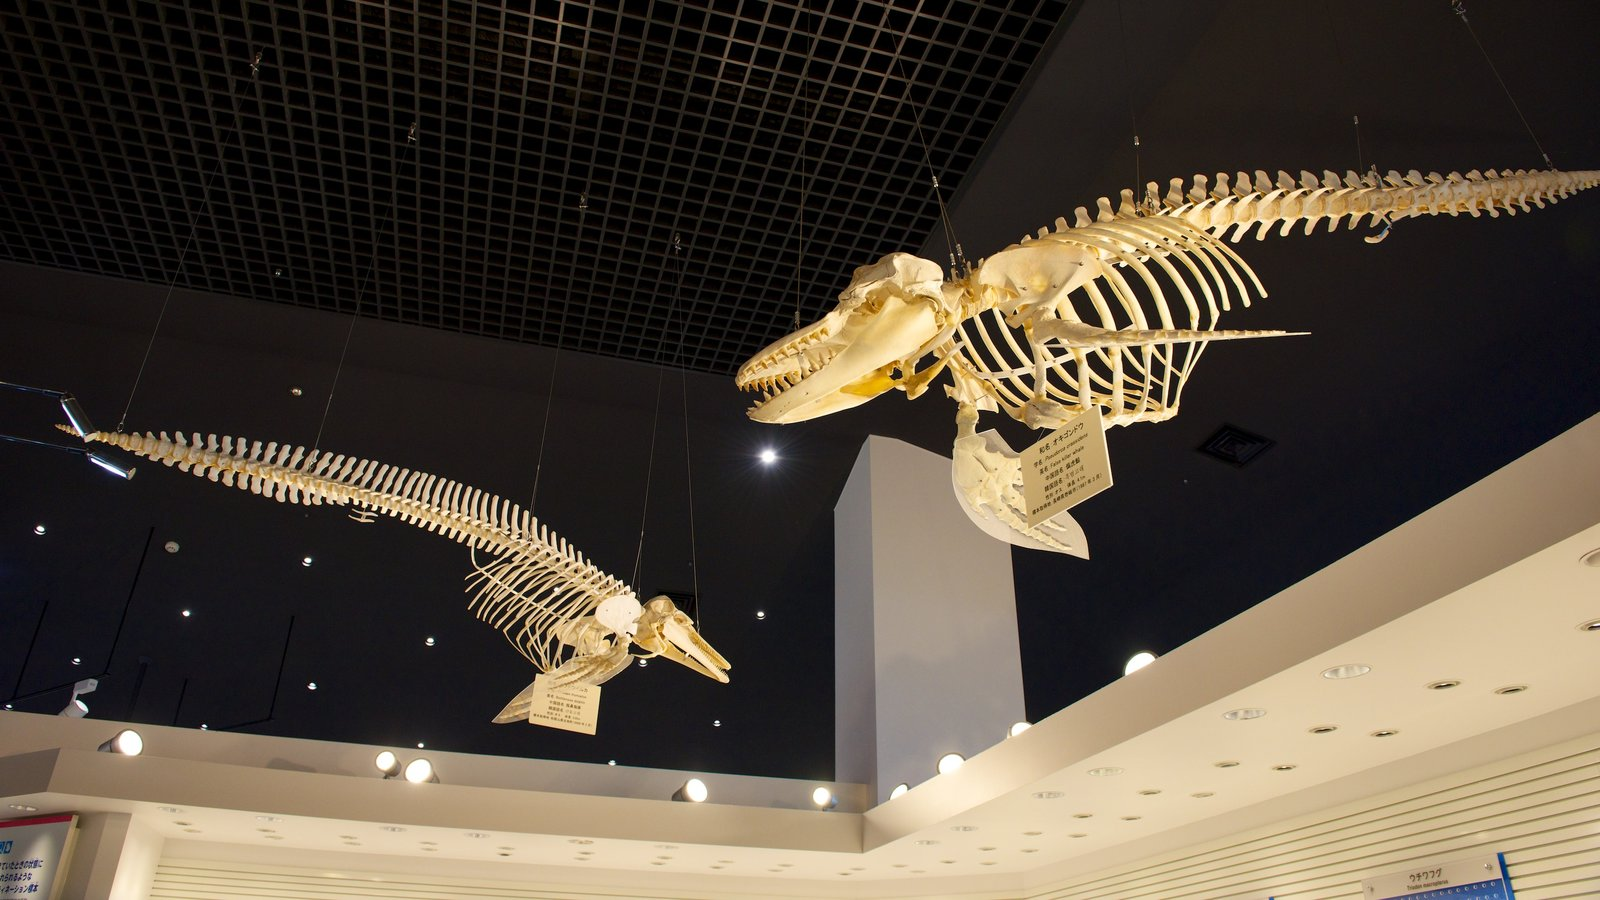 Okinawa Churaumi Aquarium featuring marine life and interior views